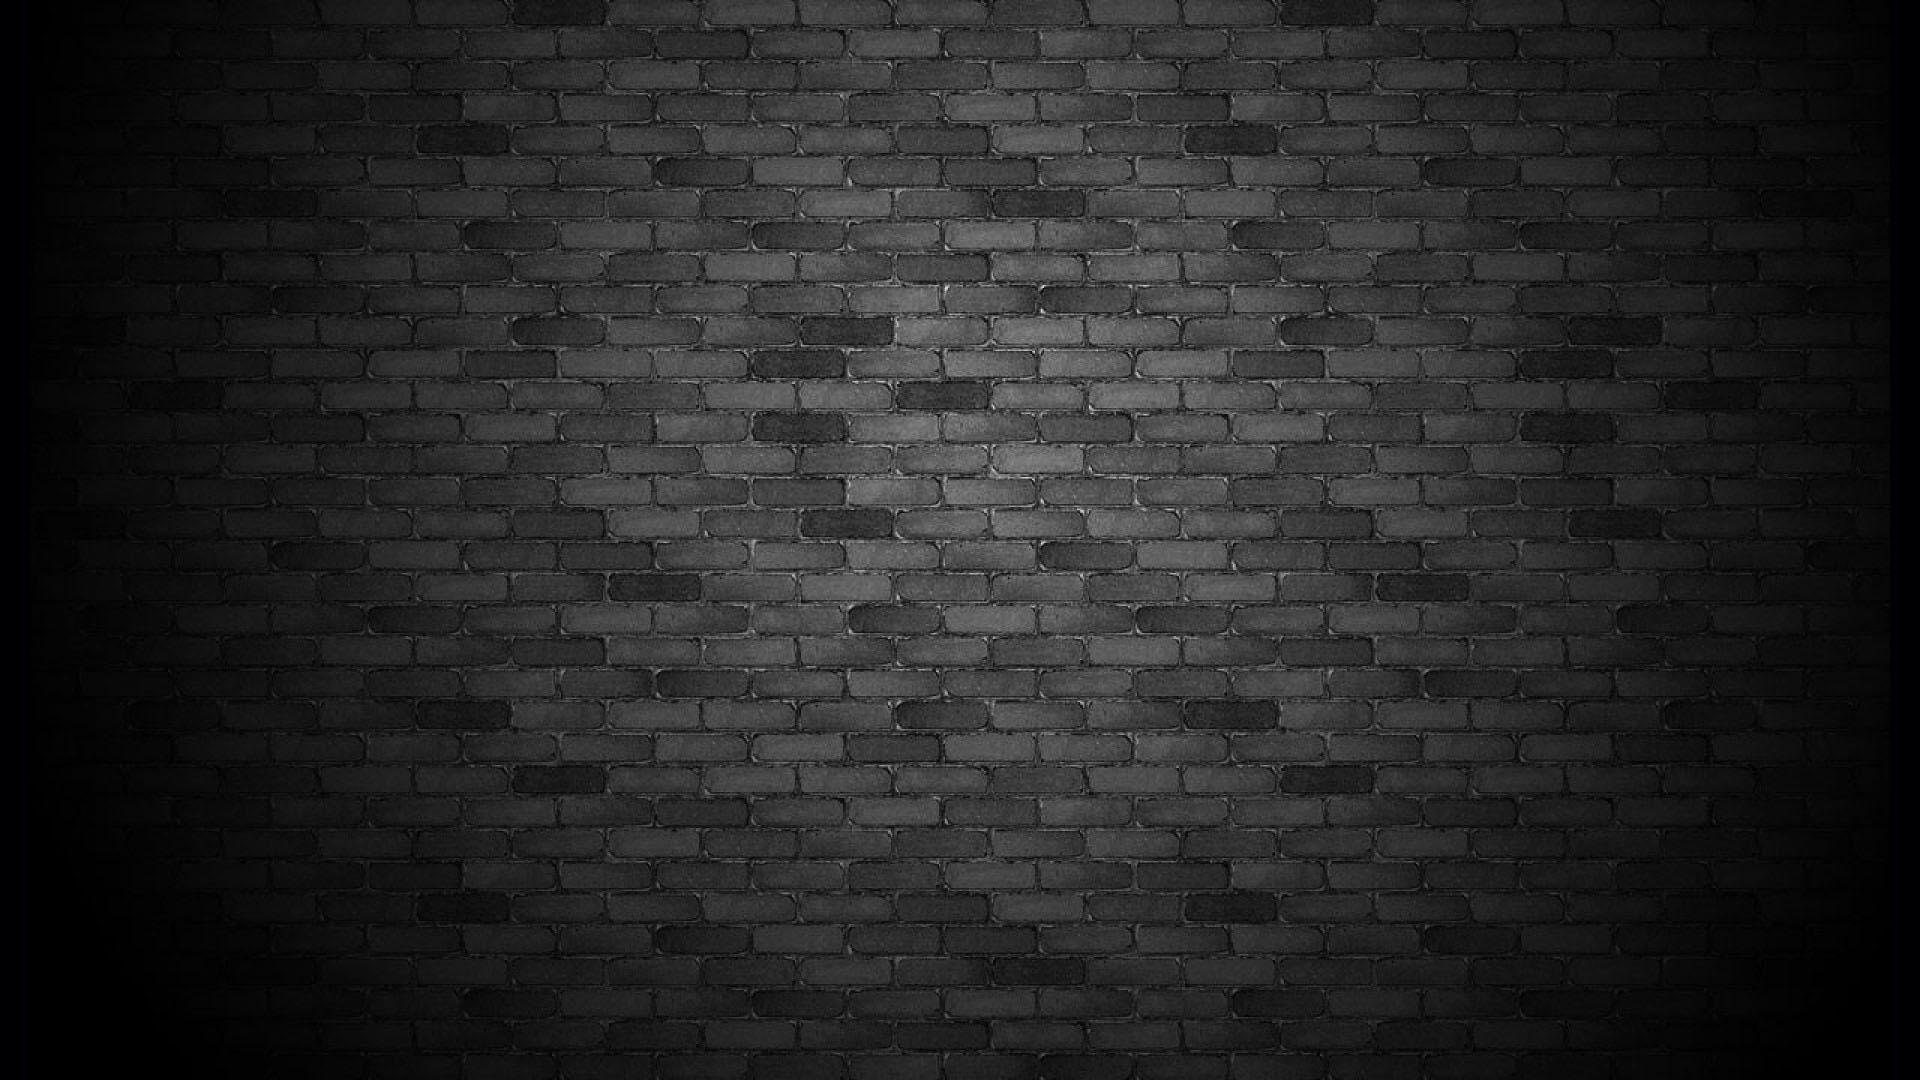 Black-Brick-Wall-Background